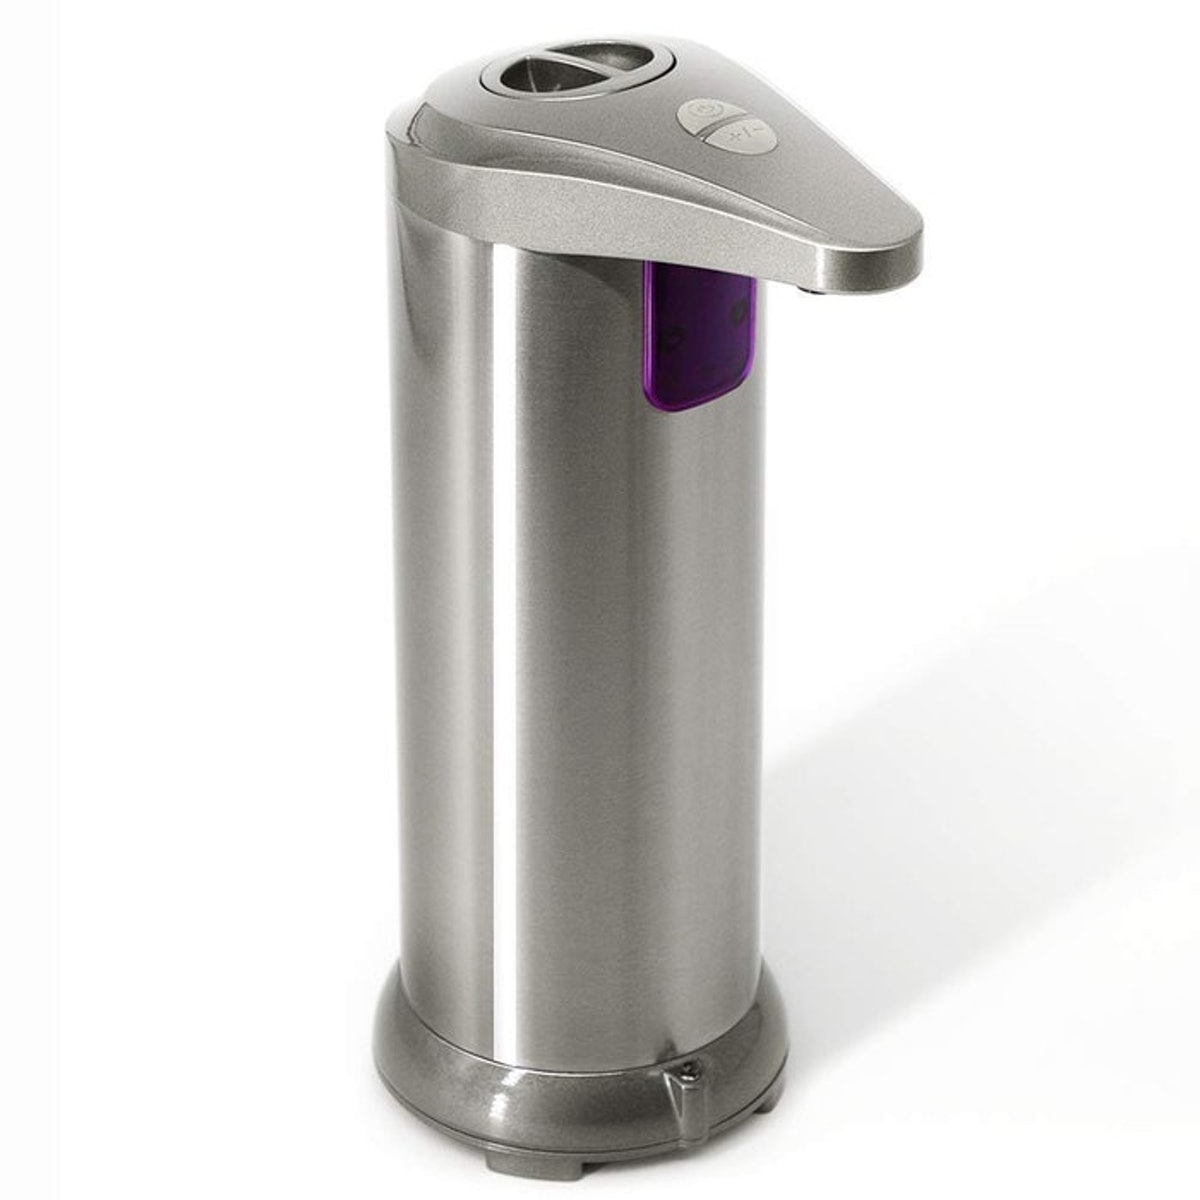 Elechok Soap Dispenser